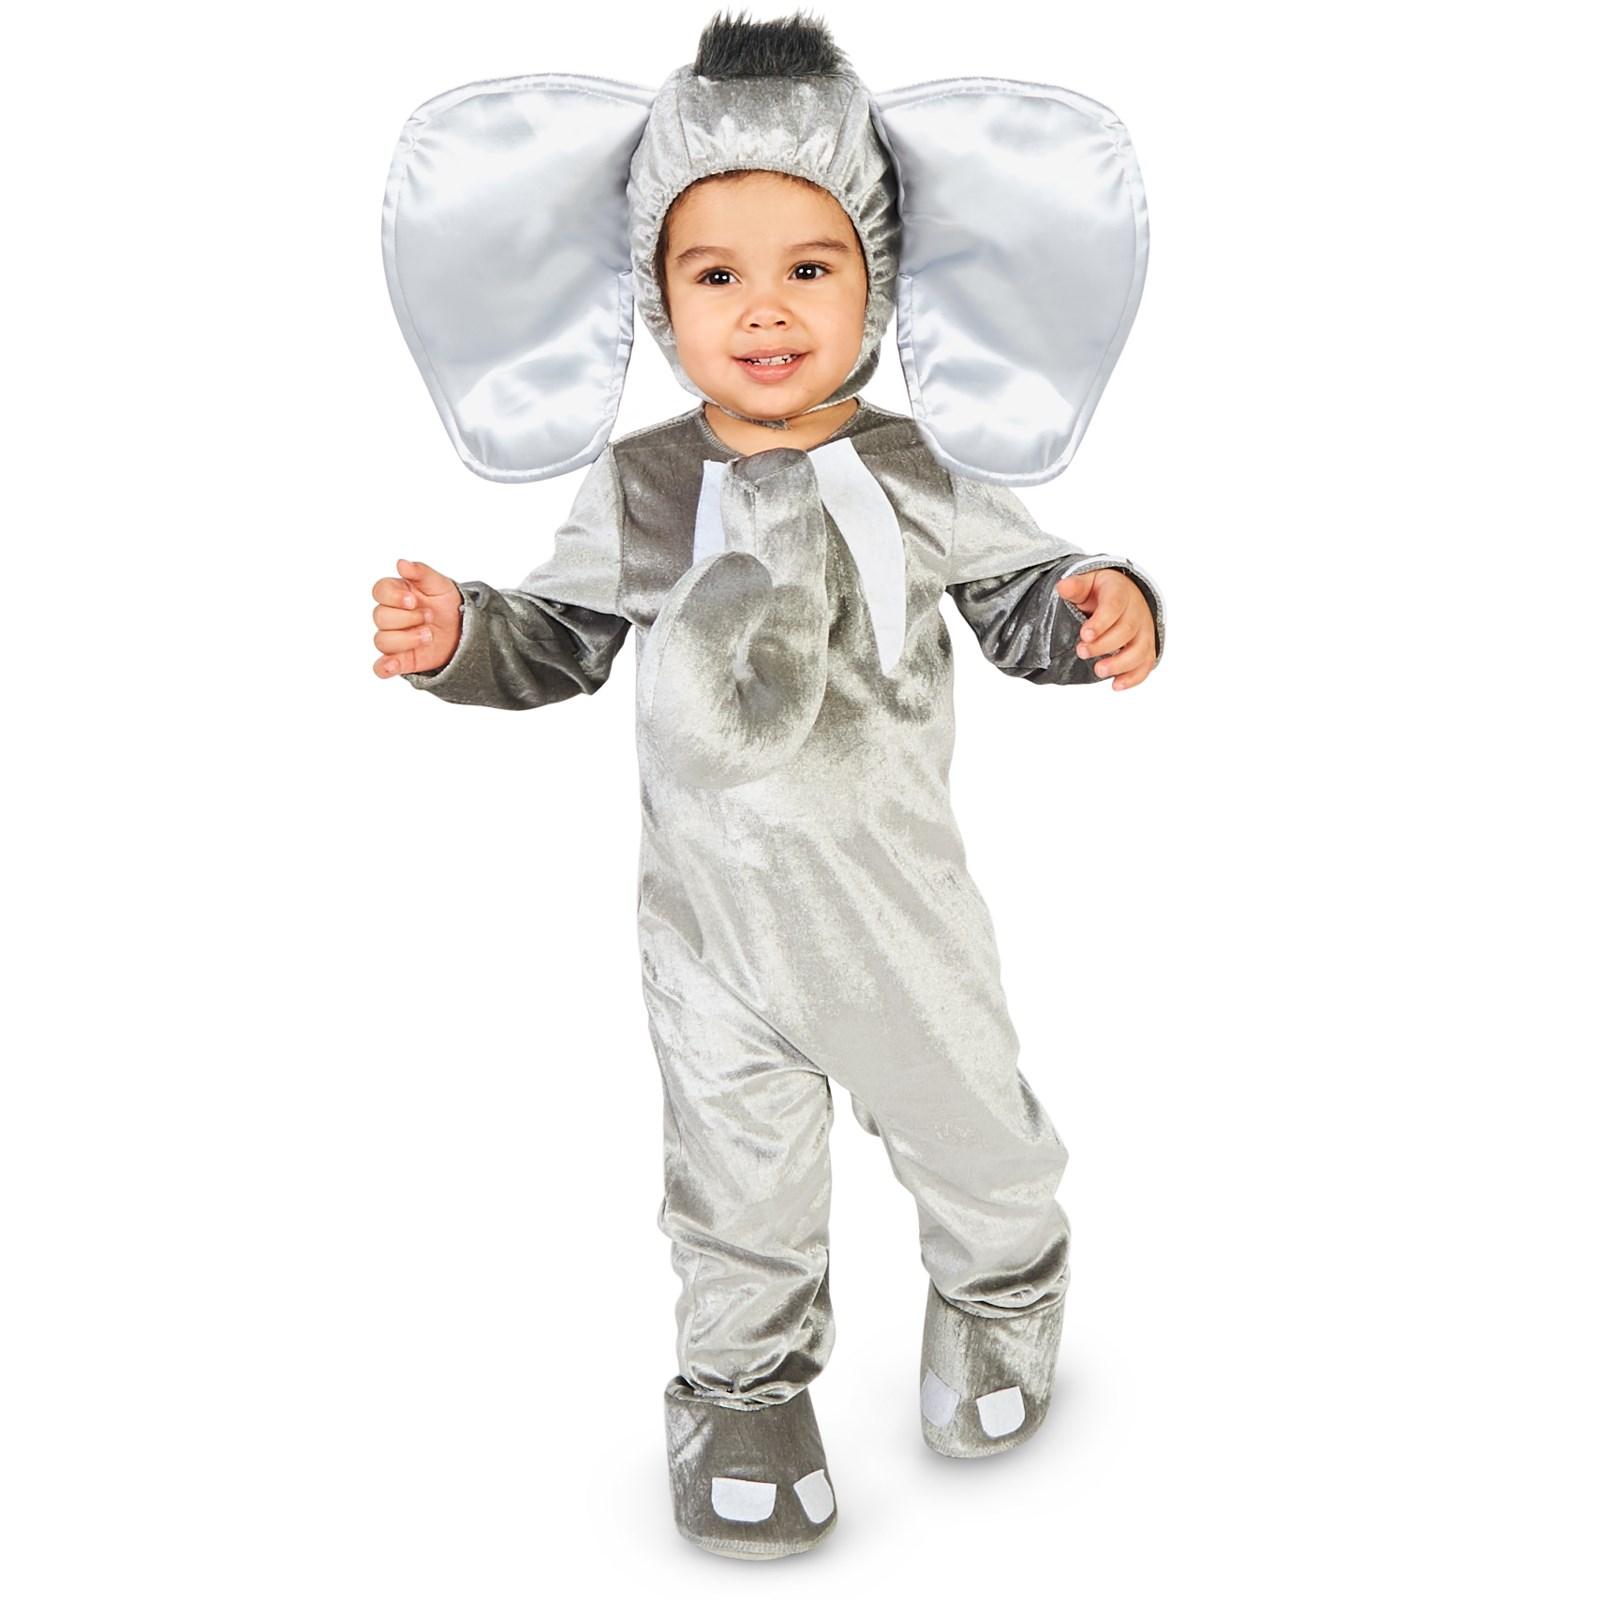 Italian Boy Name: Elephant Prince Toddler Costume